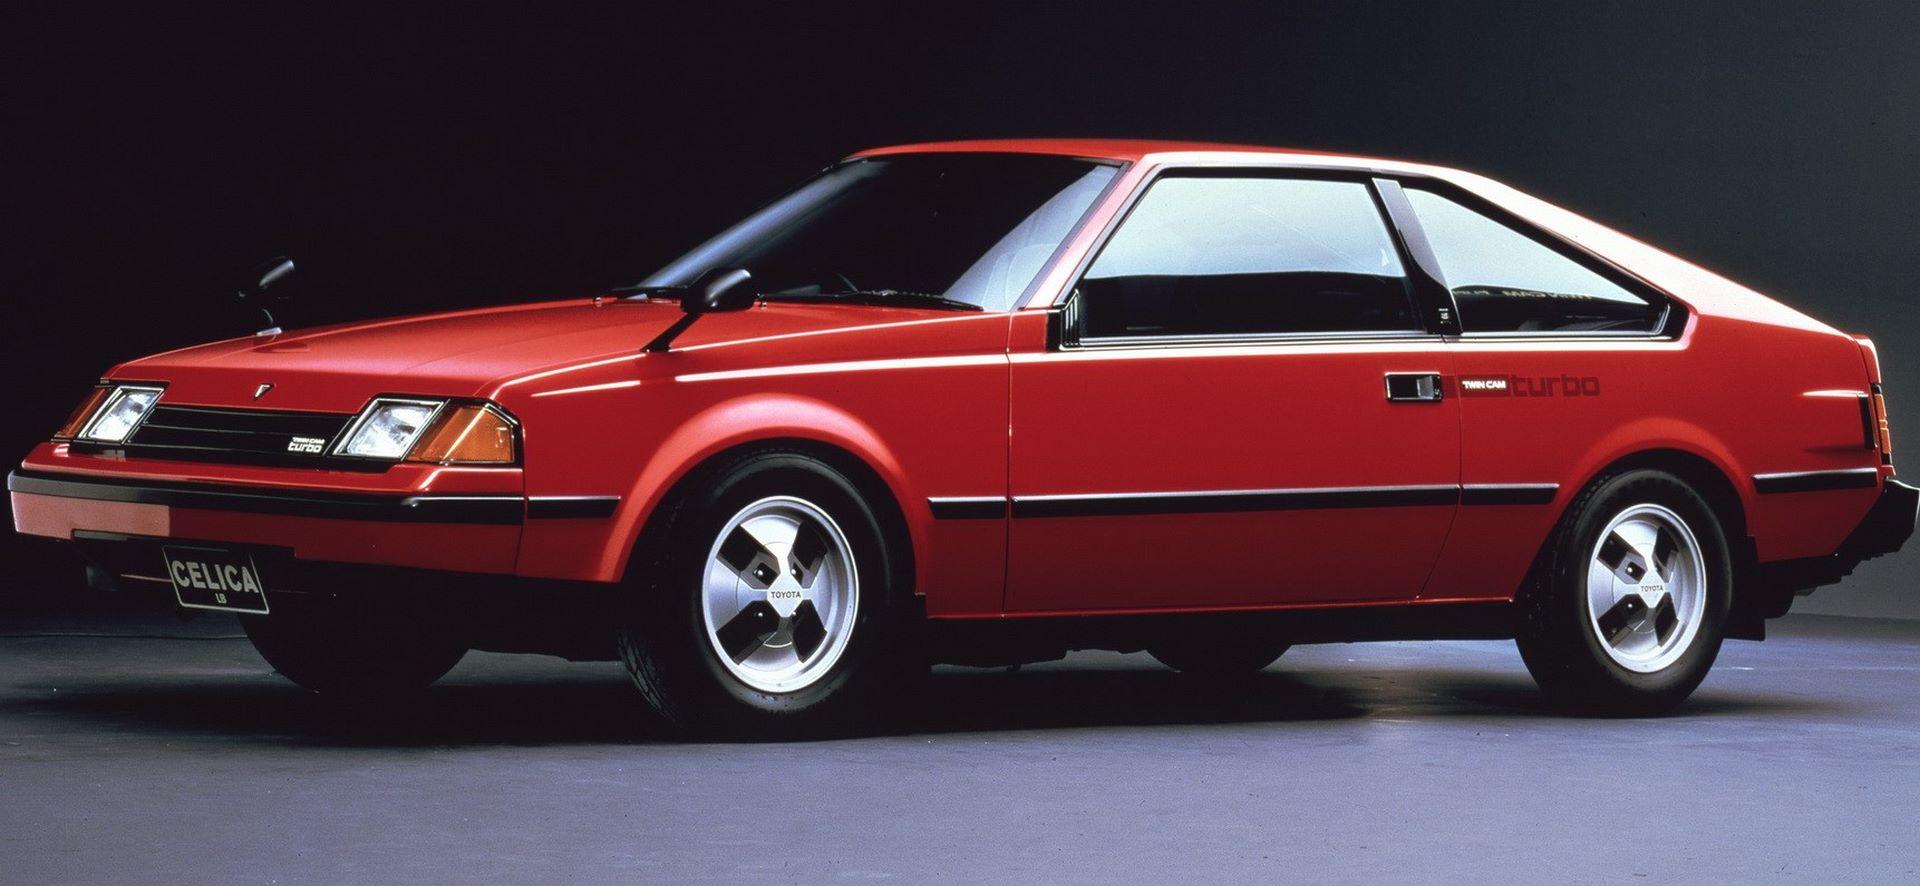 Toyota-Celica-50-years-10